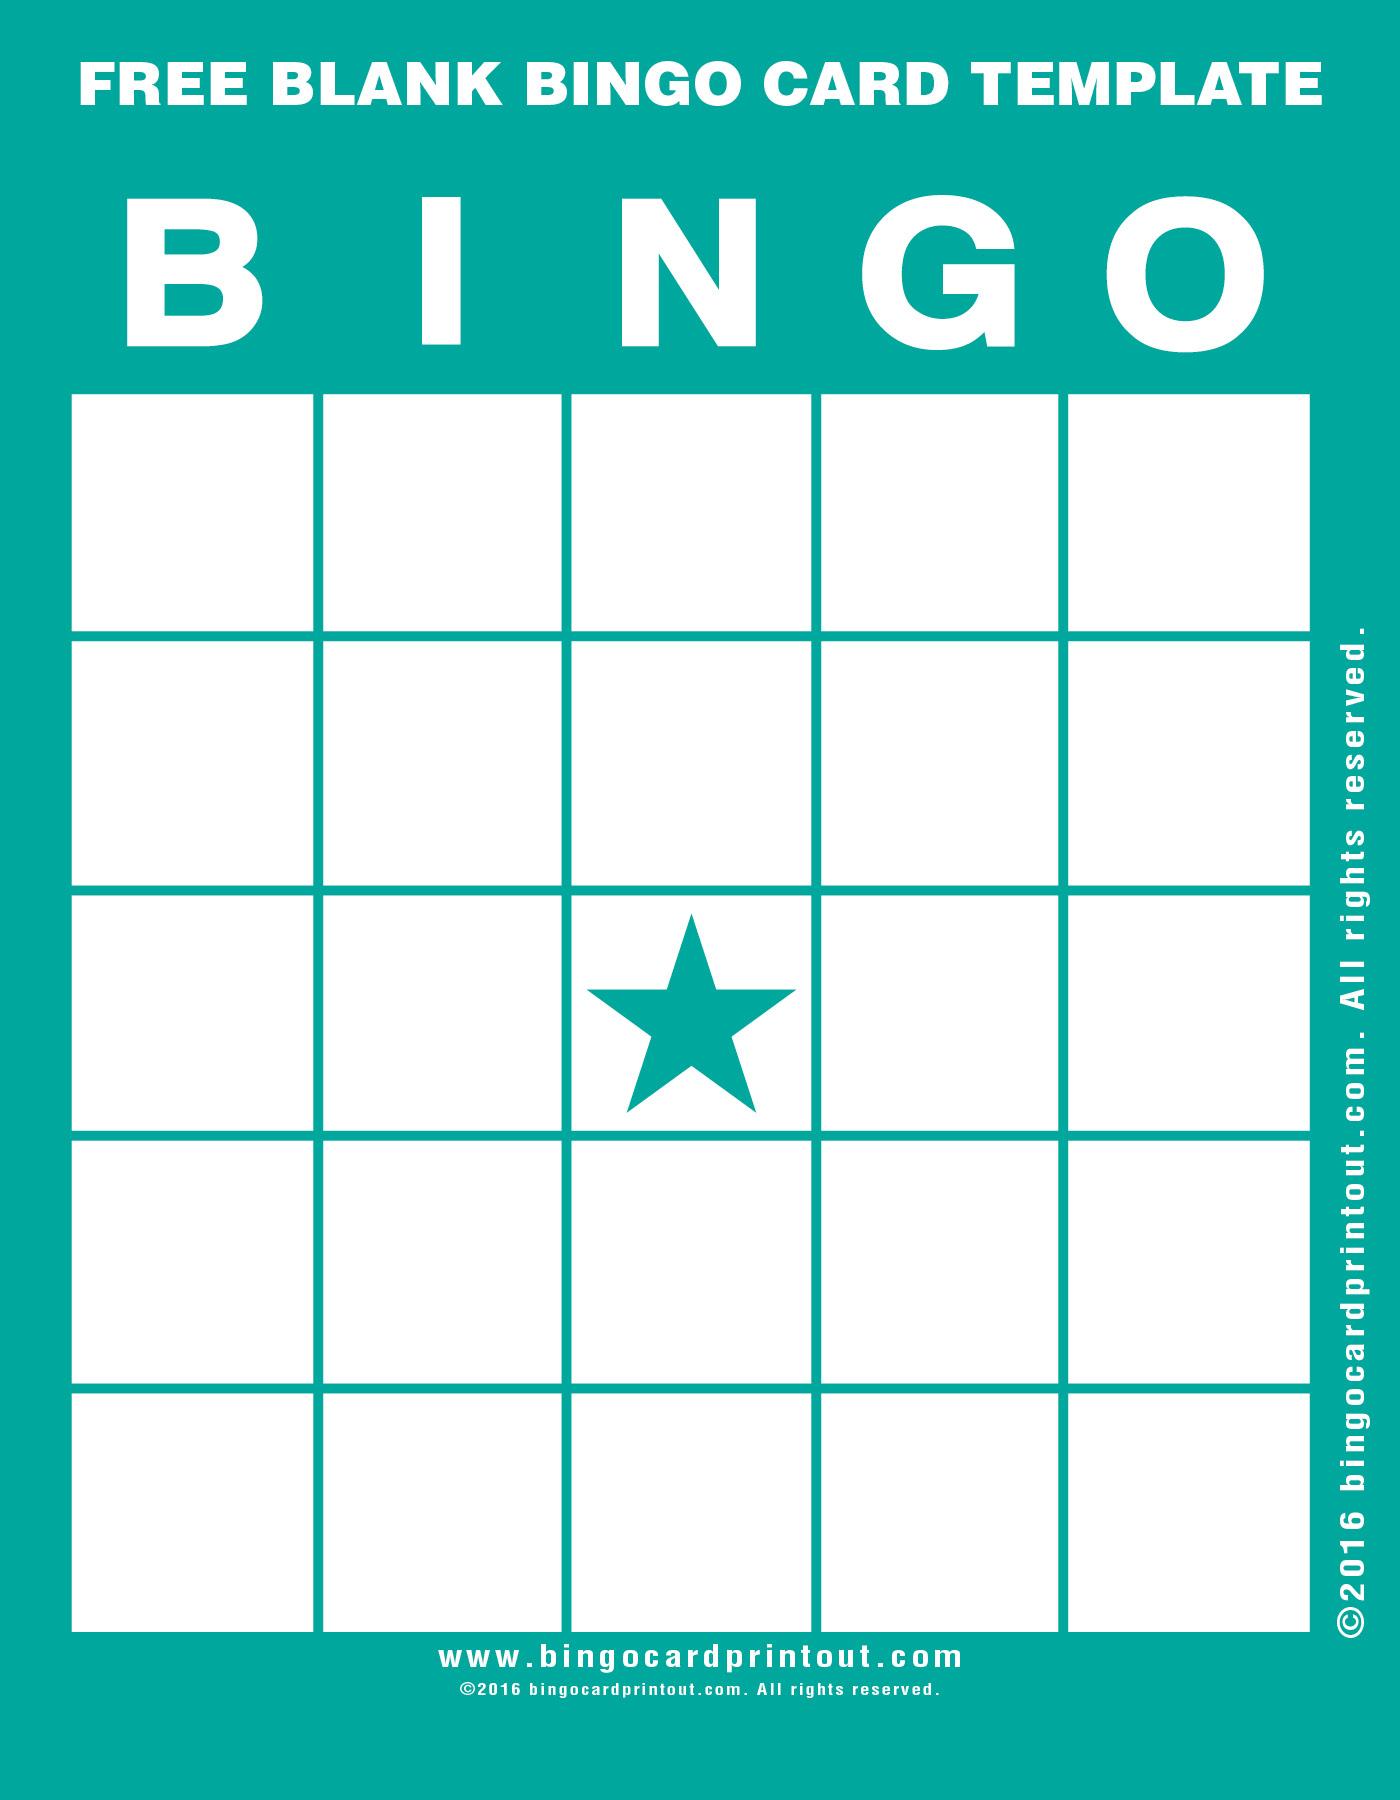 Free Blank Bingo Card Template Bingocardprintout Com